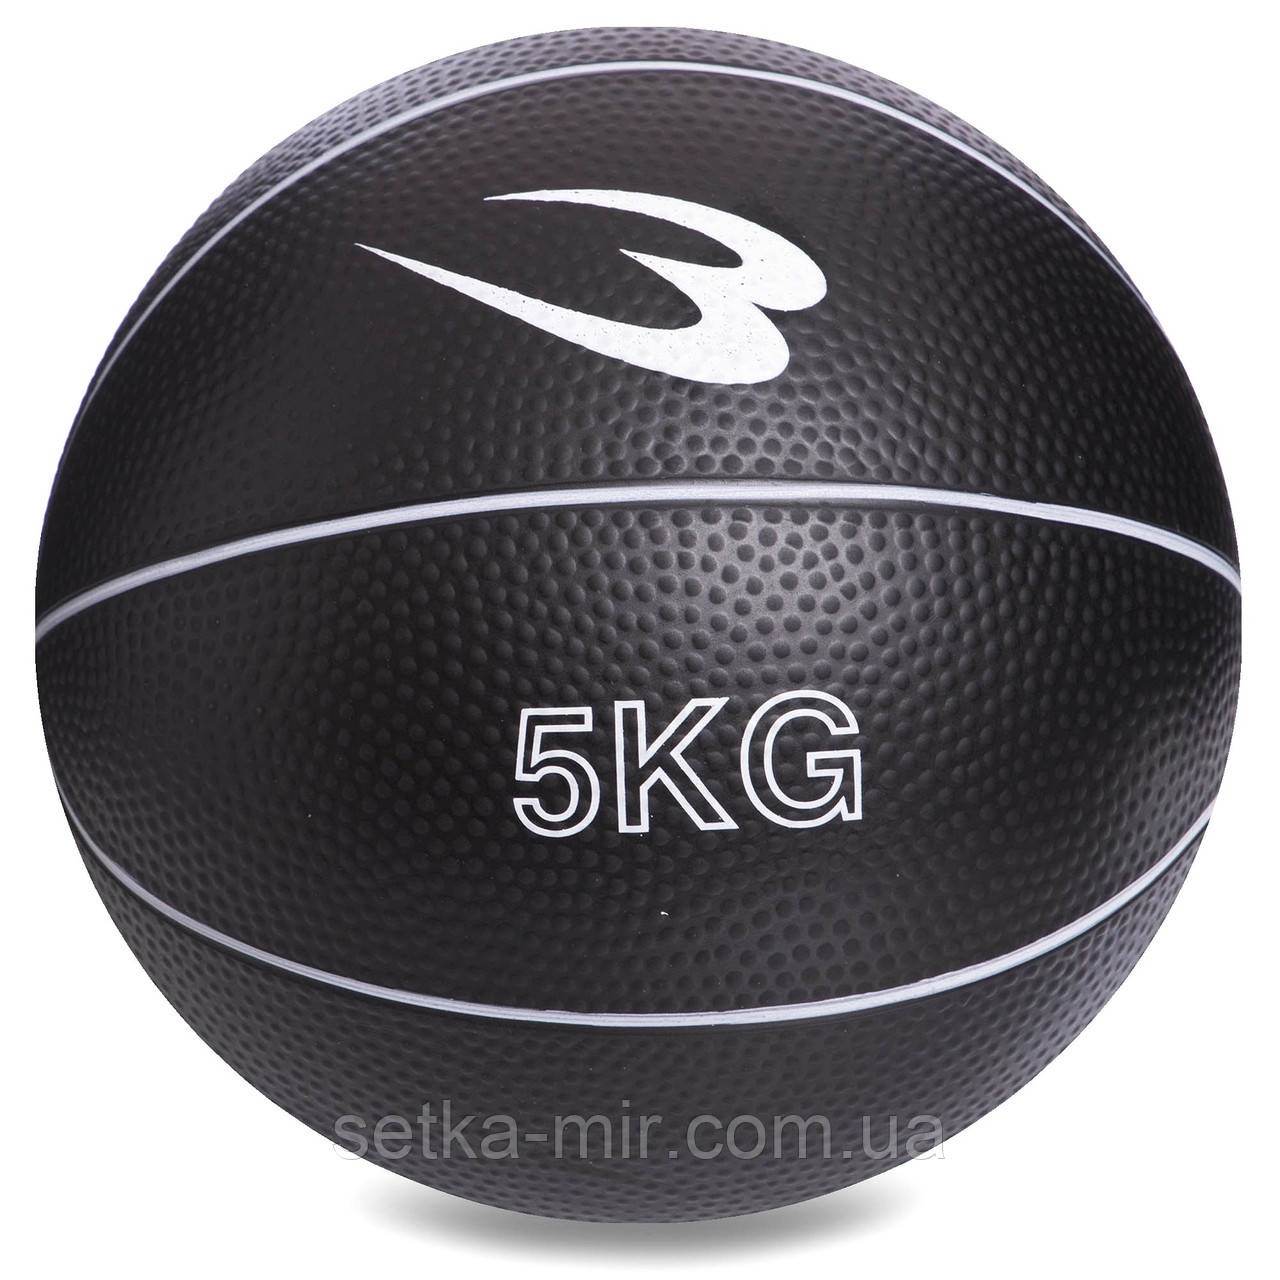 М'яч медичний медбол Record Medicine Ball SC-8407-5 5кг